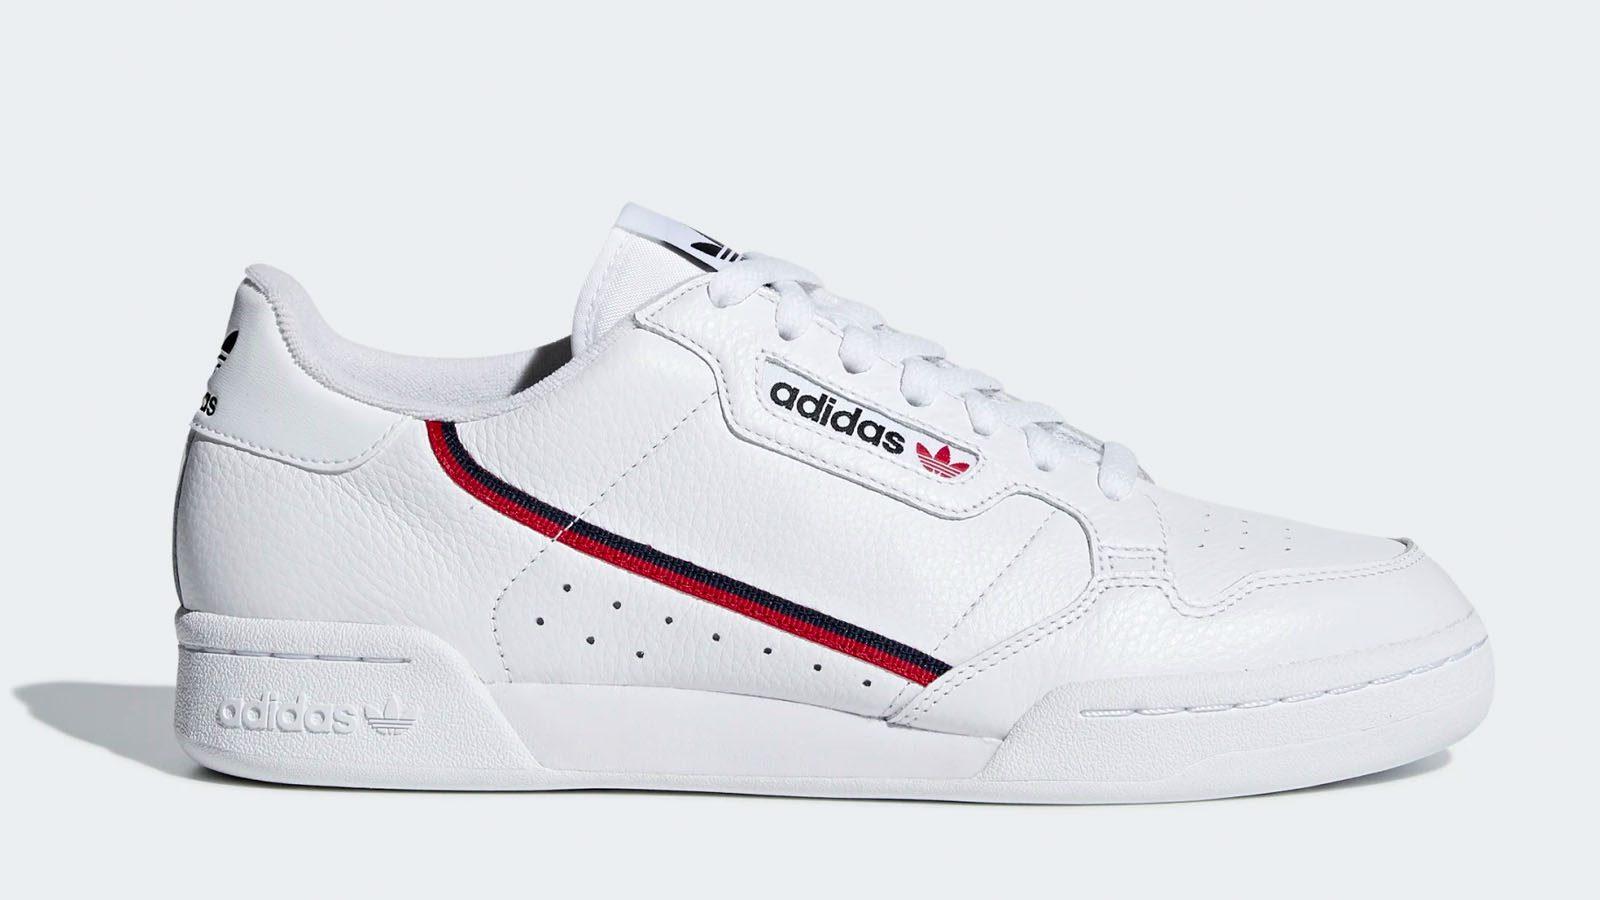 adidas listicle_0013_adidas continental 80